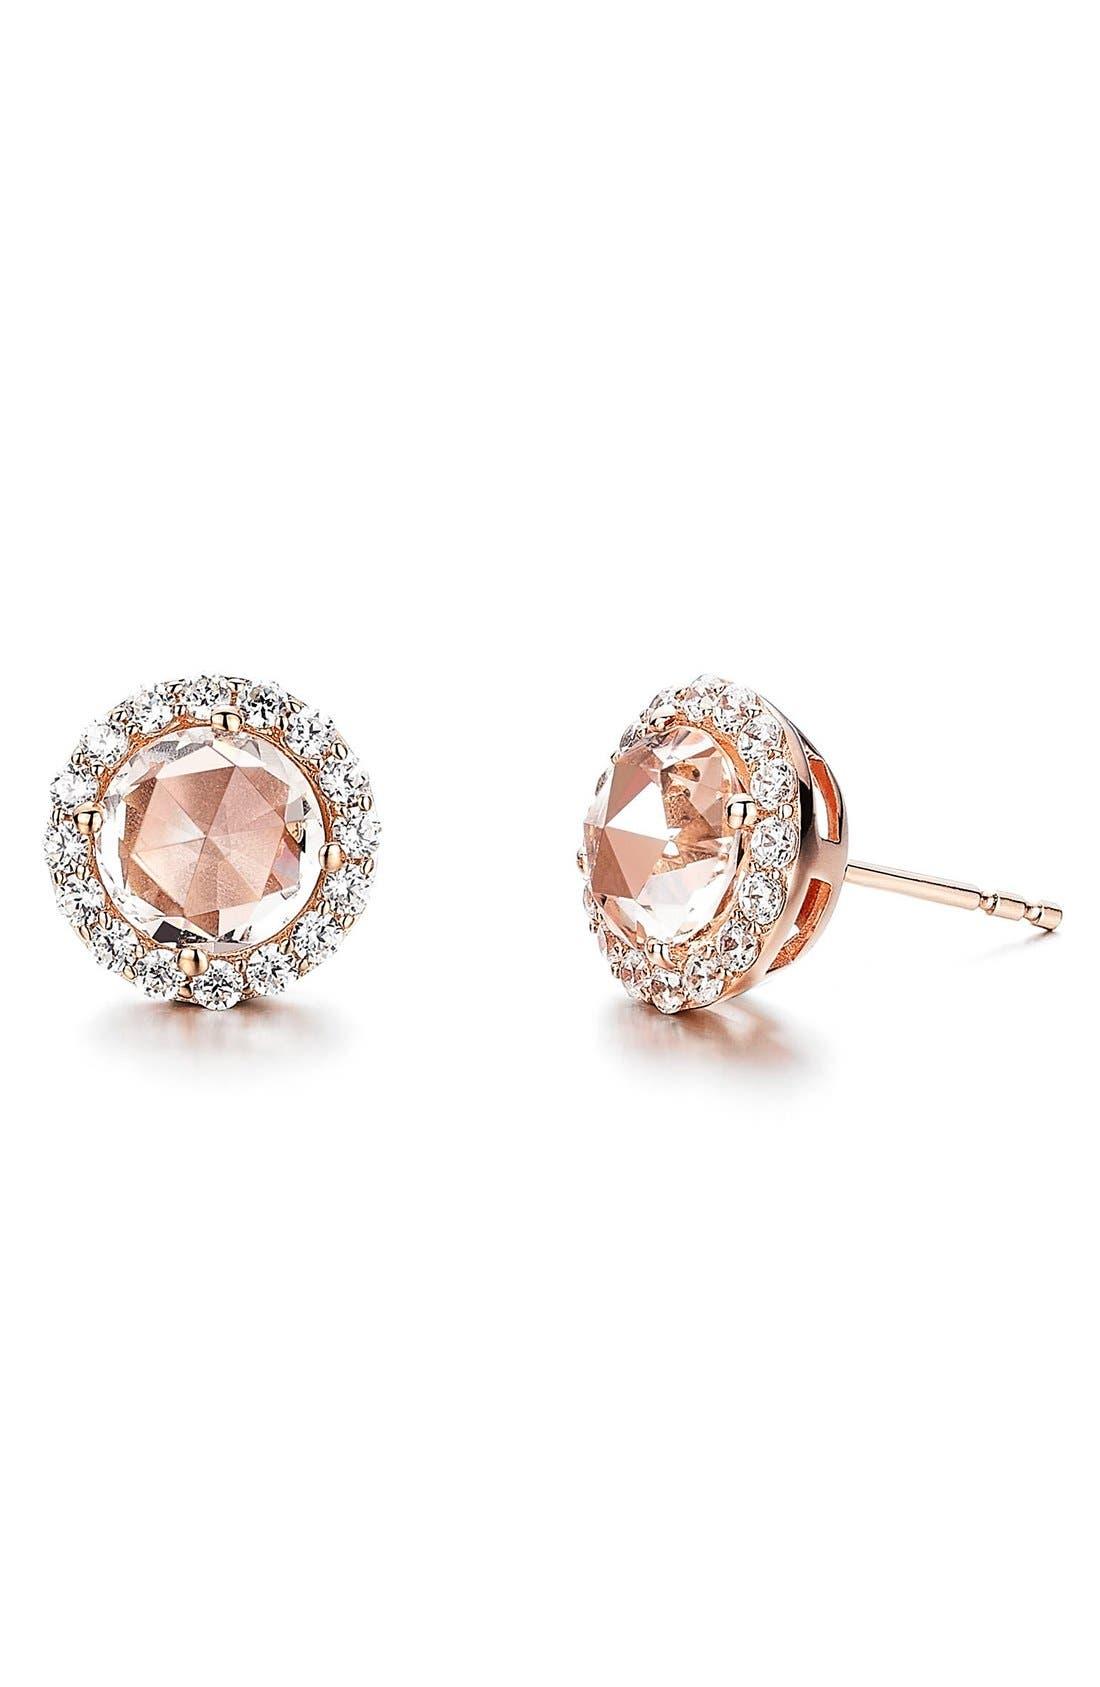 Main Image - Lafonn Stud Earrings